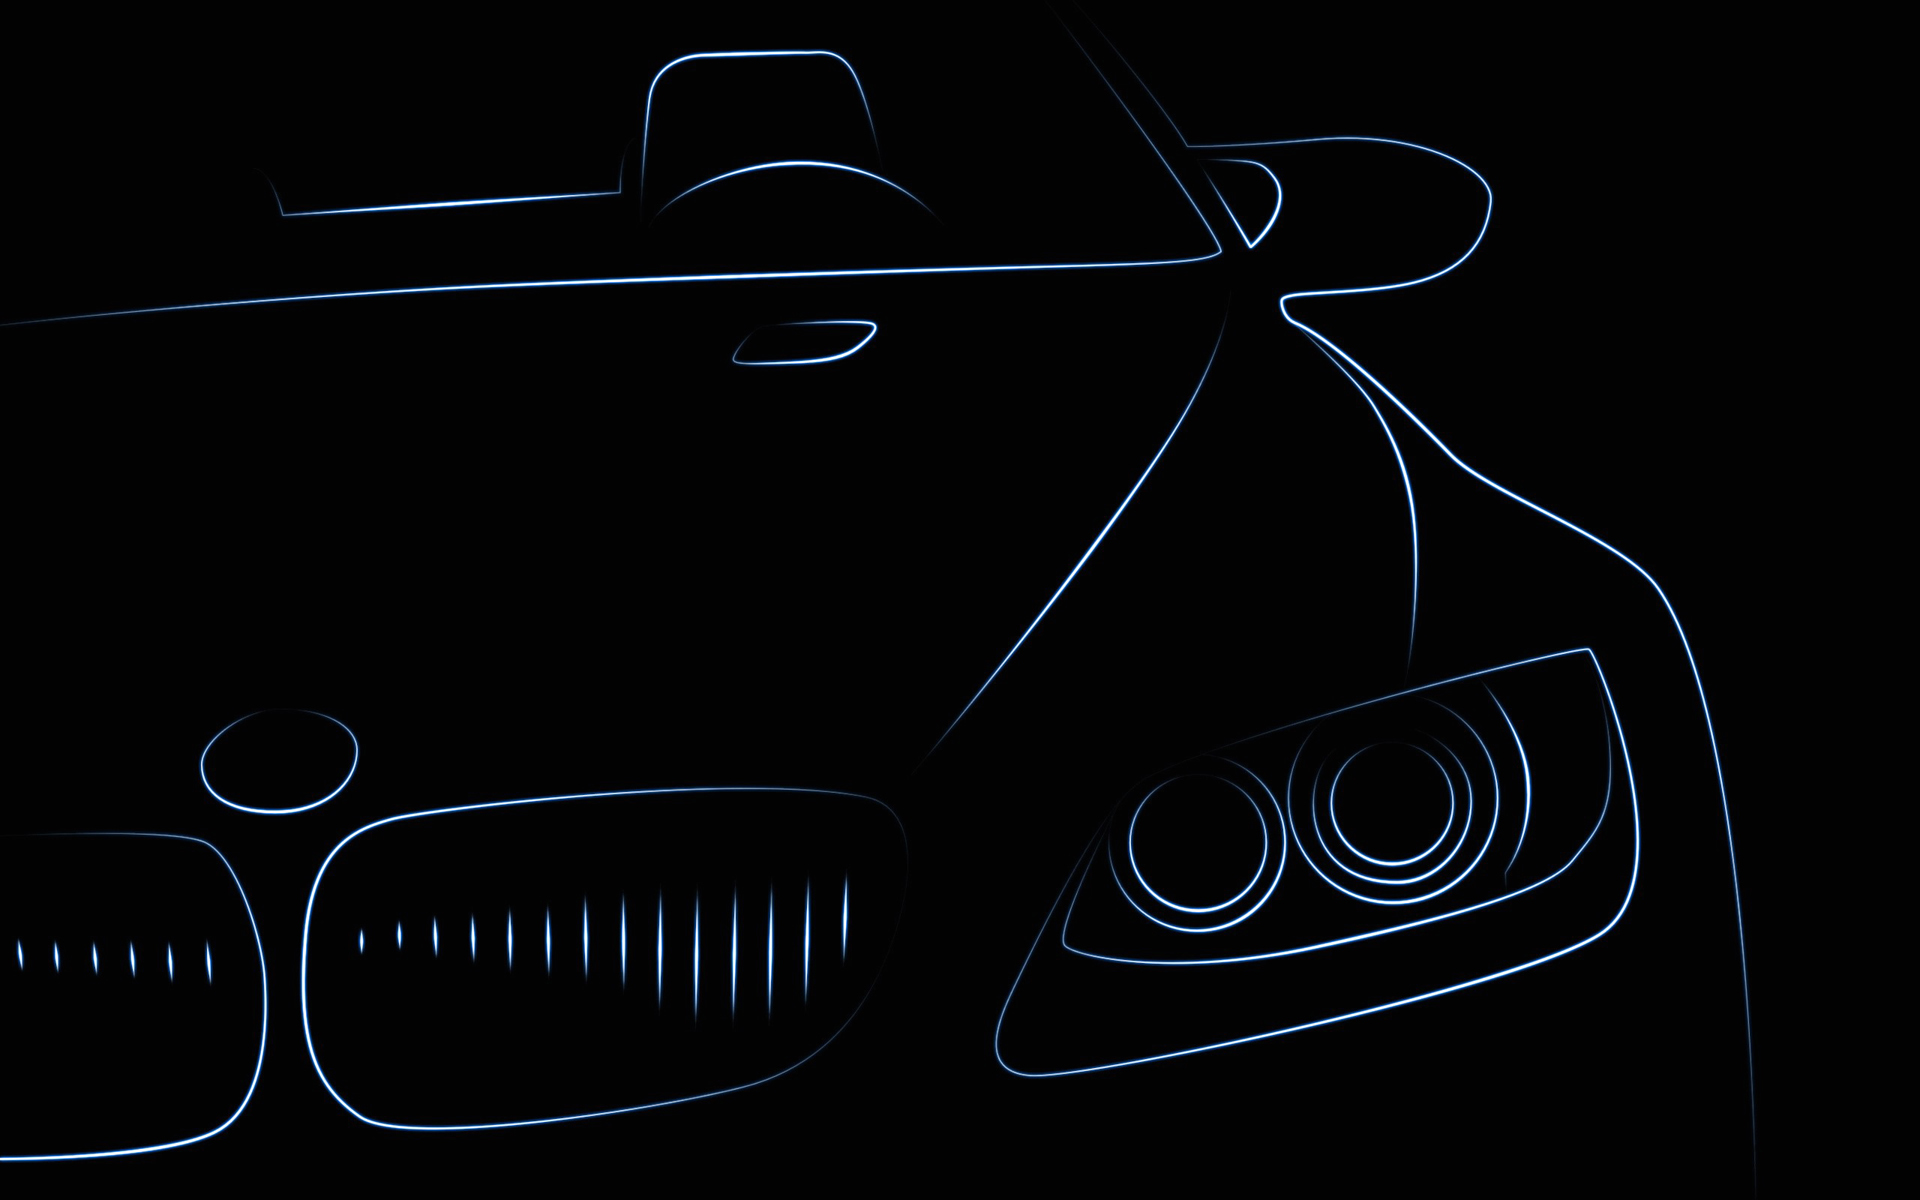 Wallpaper Bmw Auto Front Headlights Painting Art Vector Graphics